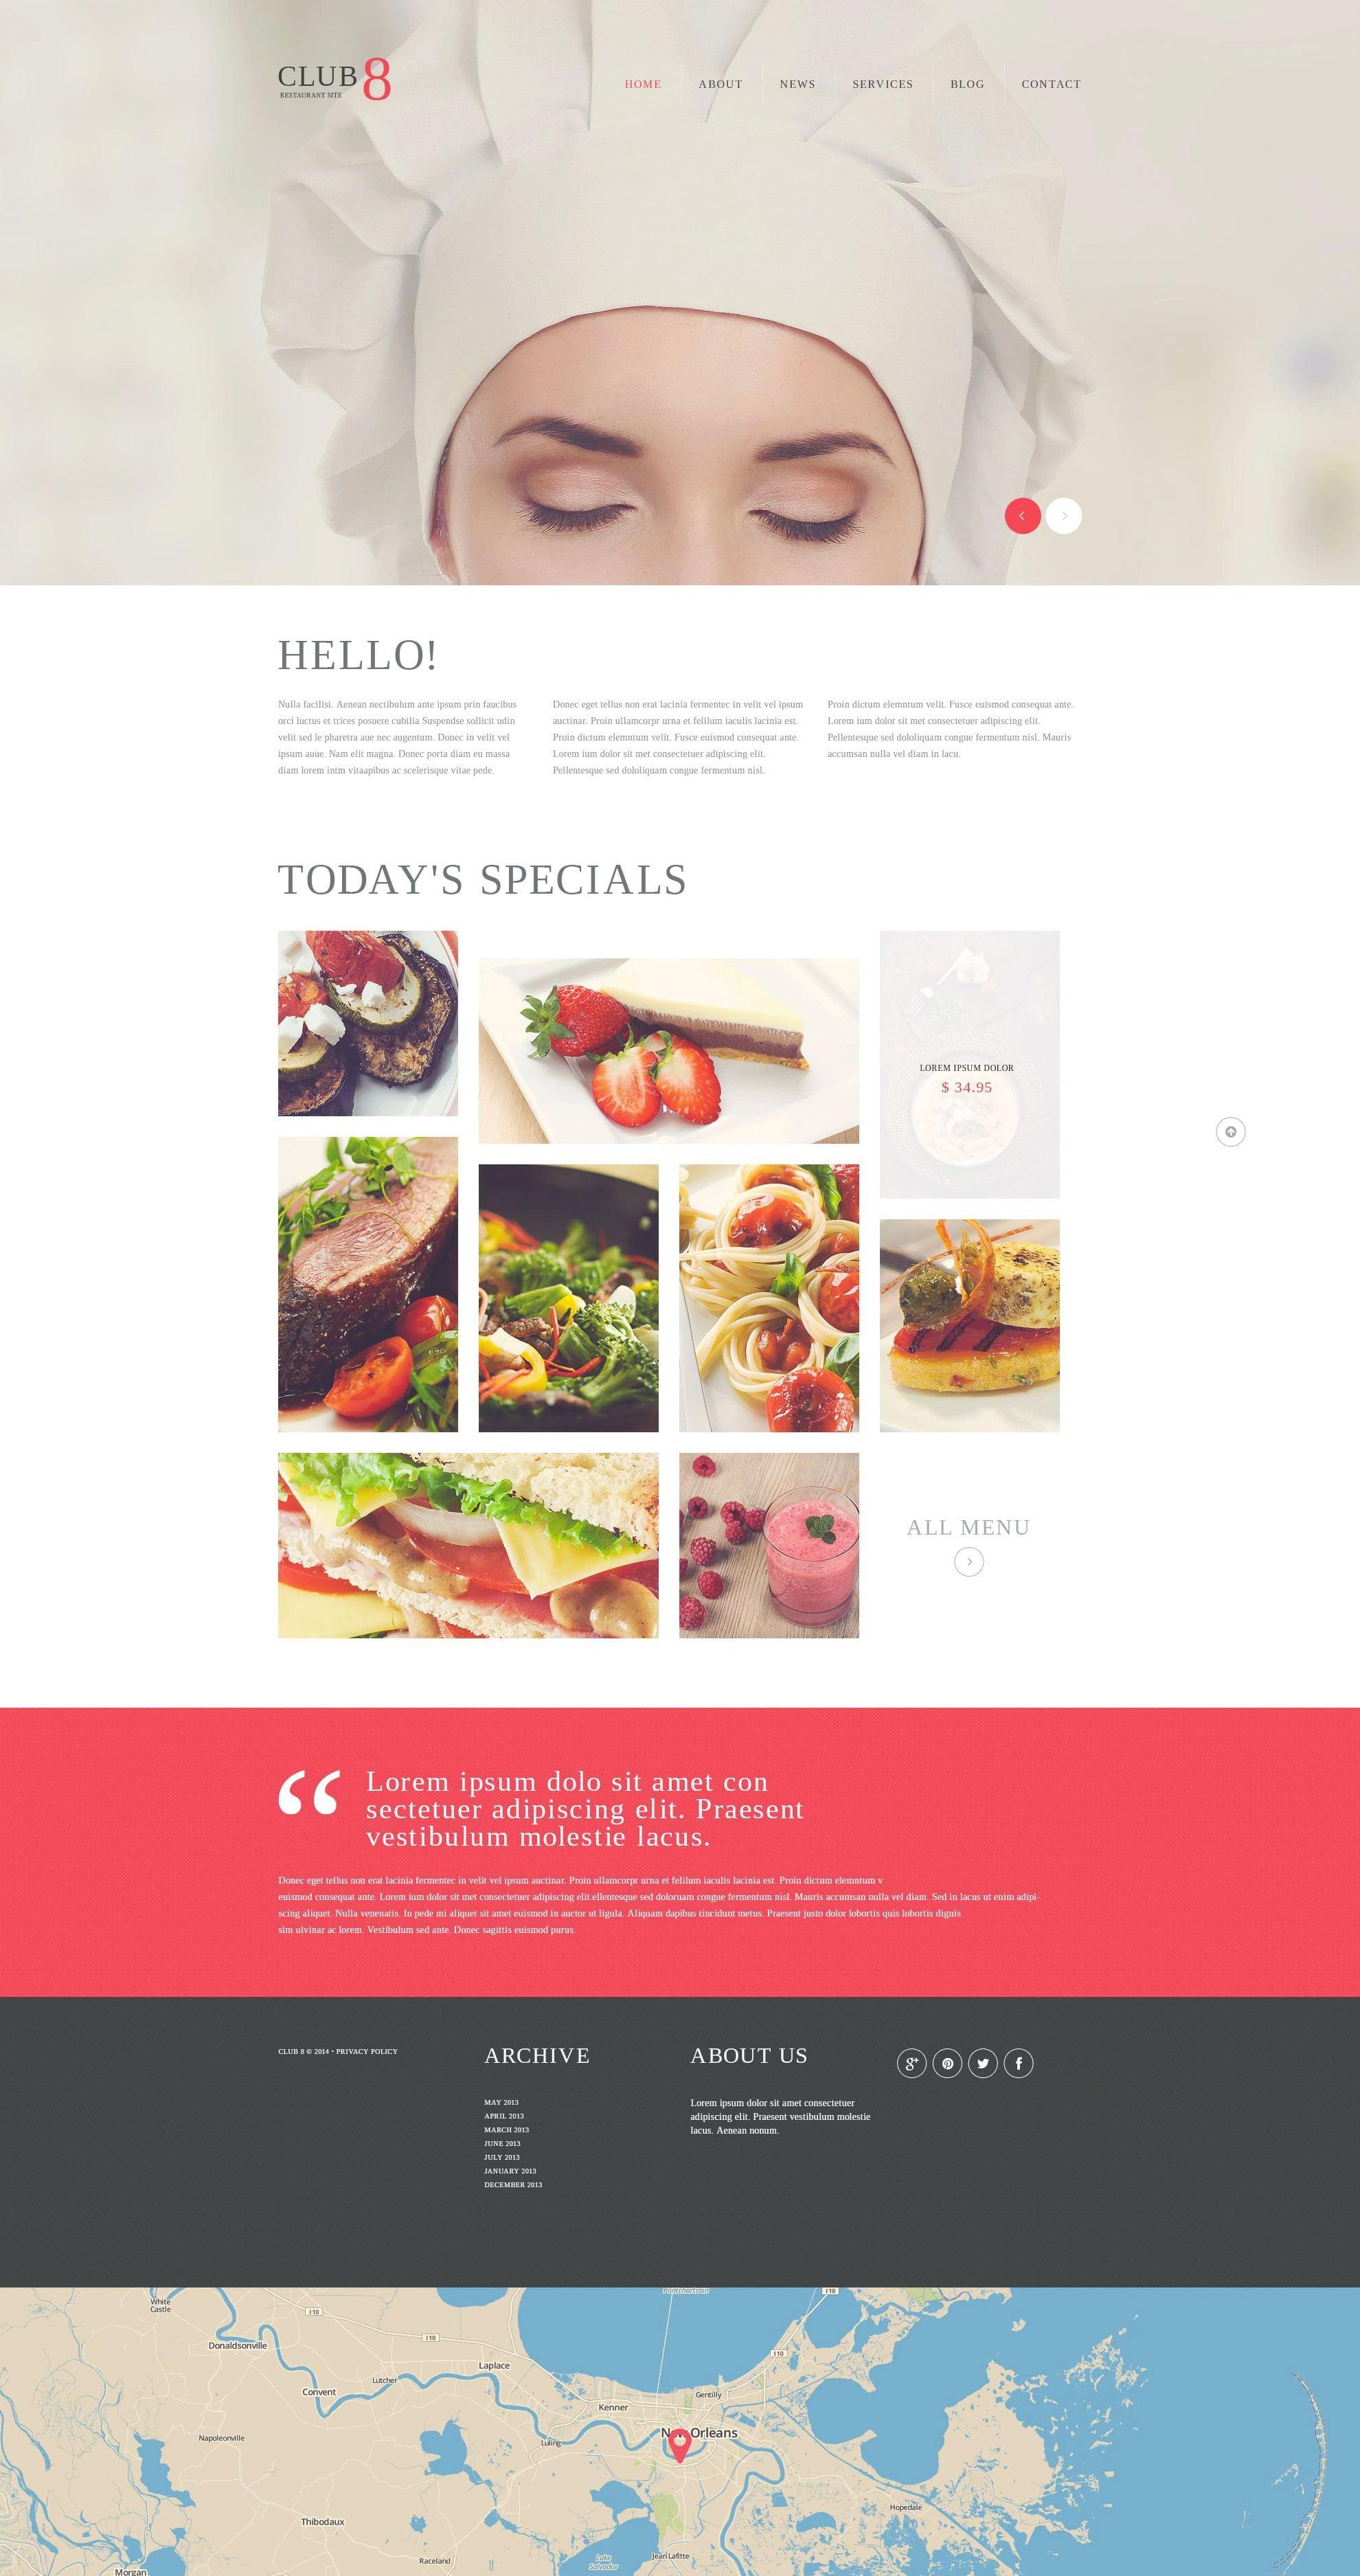 WordPress Food Blog Themes - 10 Premium WP Templates - Untitled 3